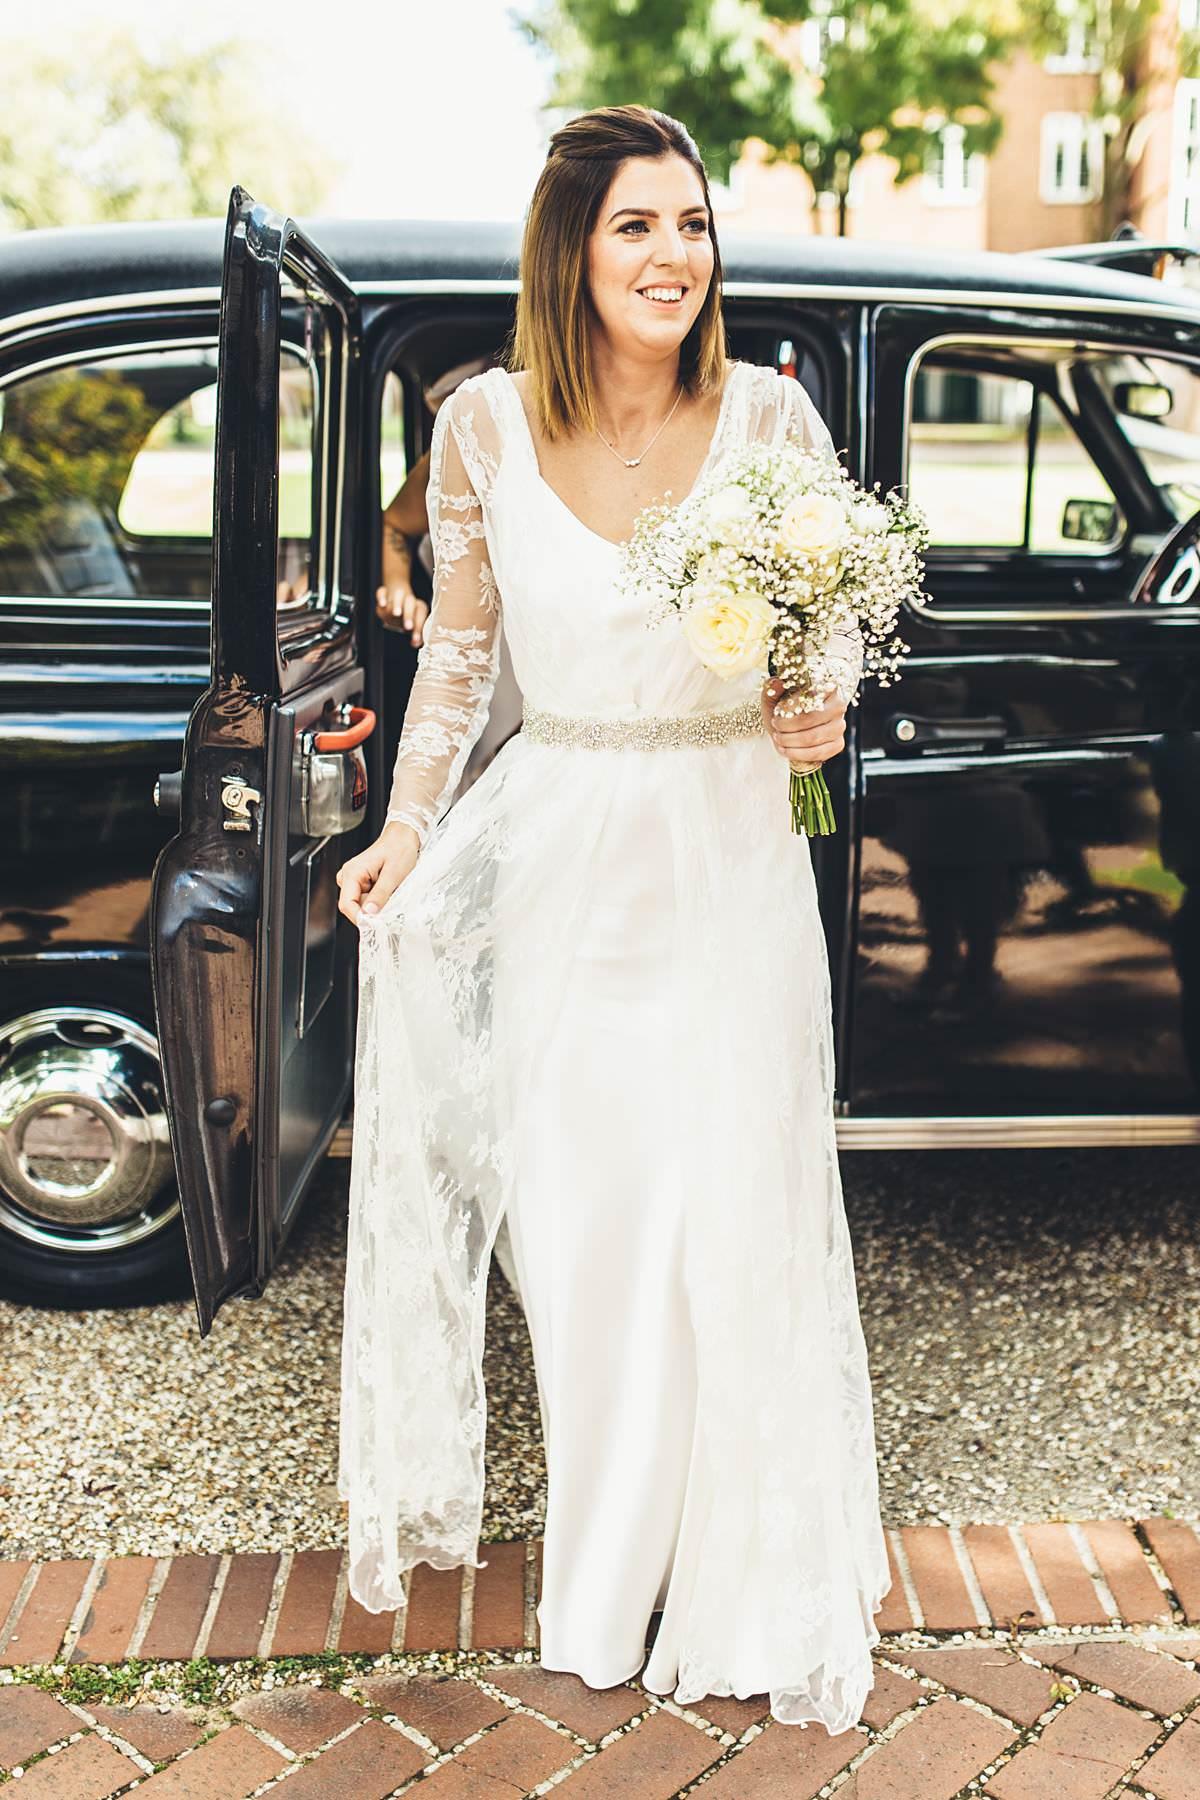 Bromley Garden Room London Wedding Photography